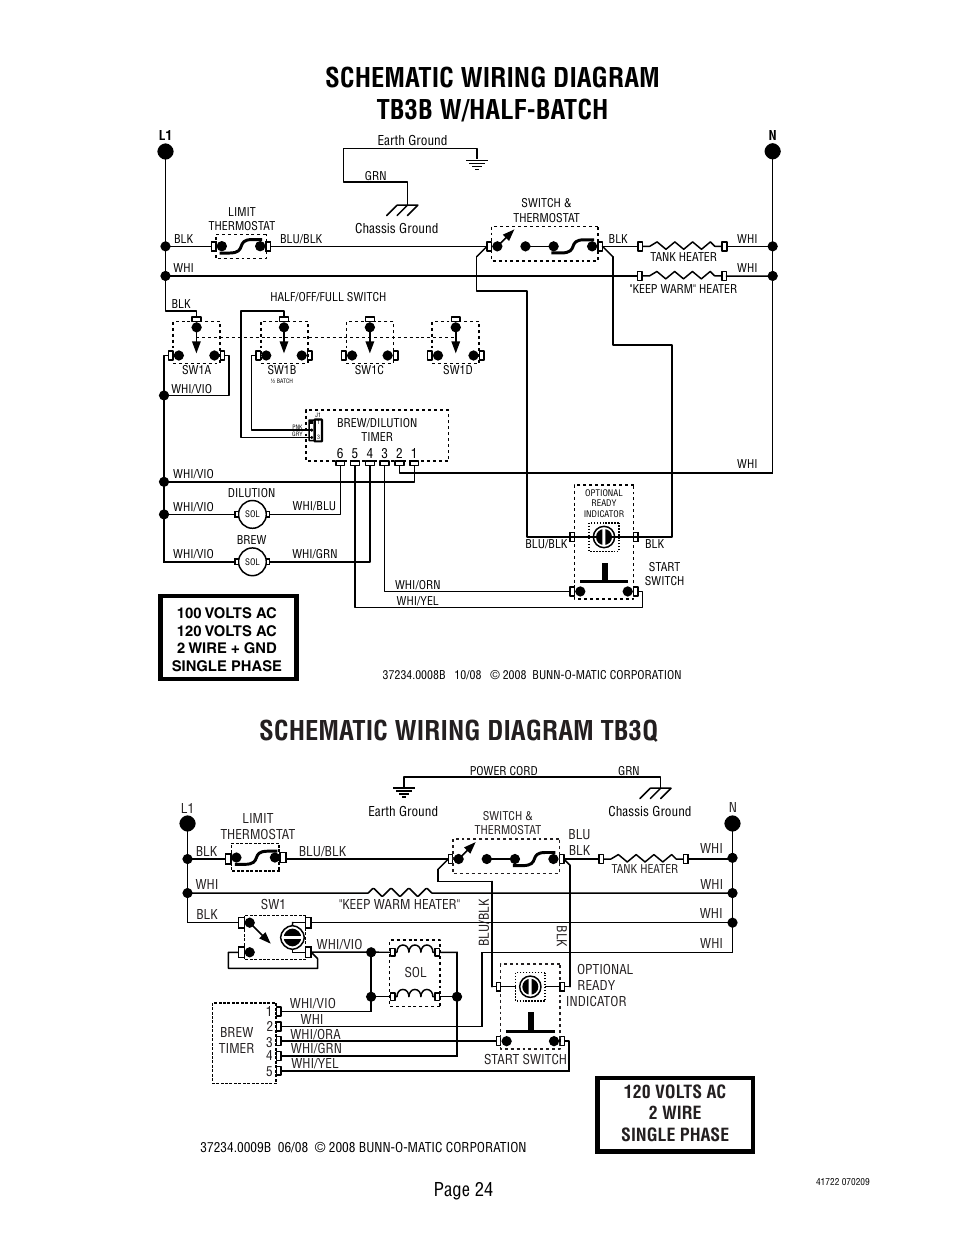 Schematic Wiring Diagram Tb3b W  Half